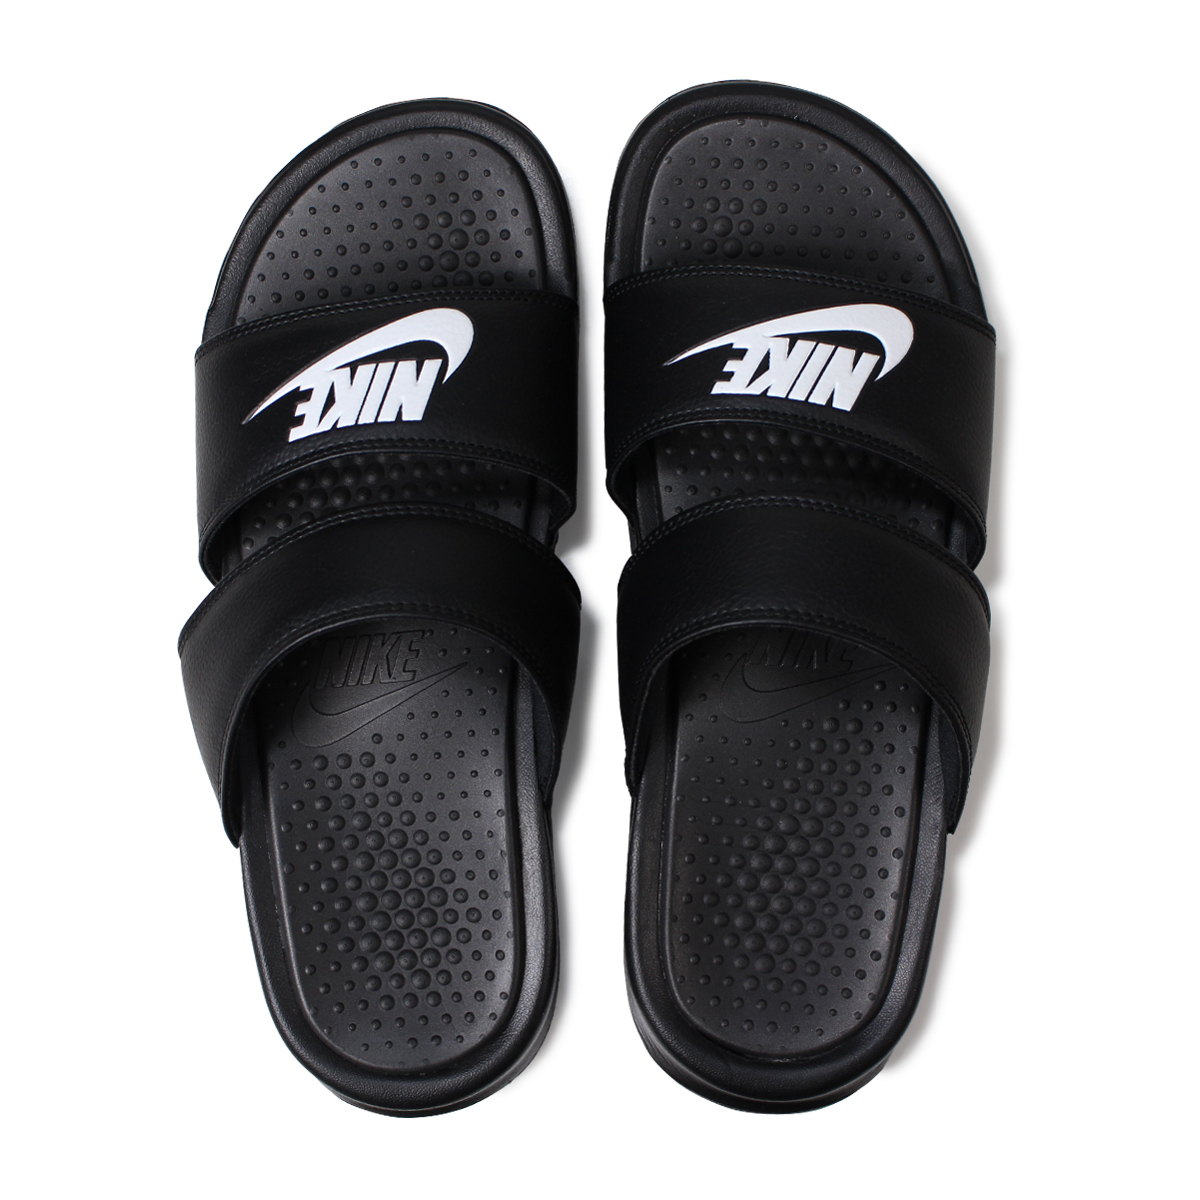 b3b18d449860 NIKE WMNS BENASSI DUO ULTRA SLIDE Nike sandals べ ナッシシャワーサンダルスポーツレディースメンズ  819